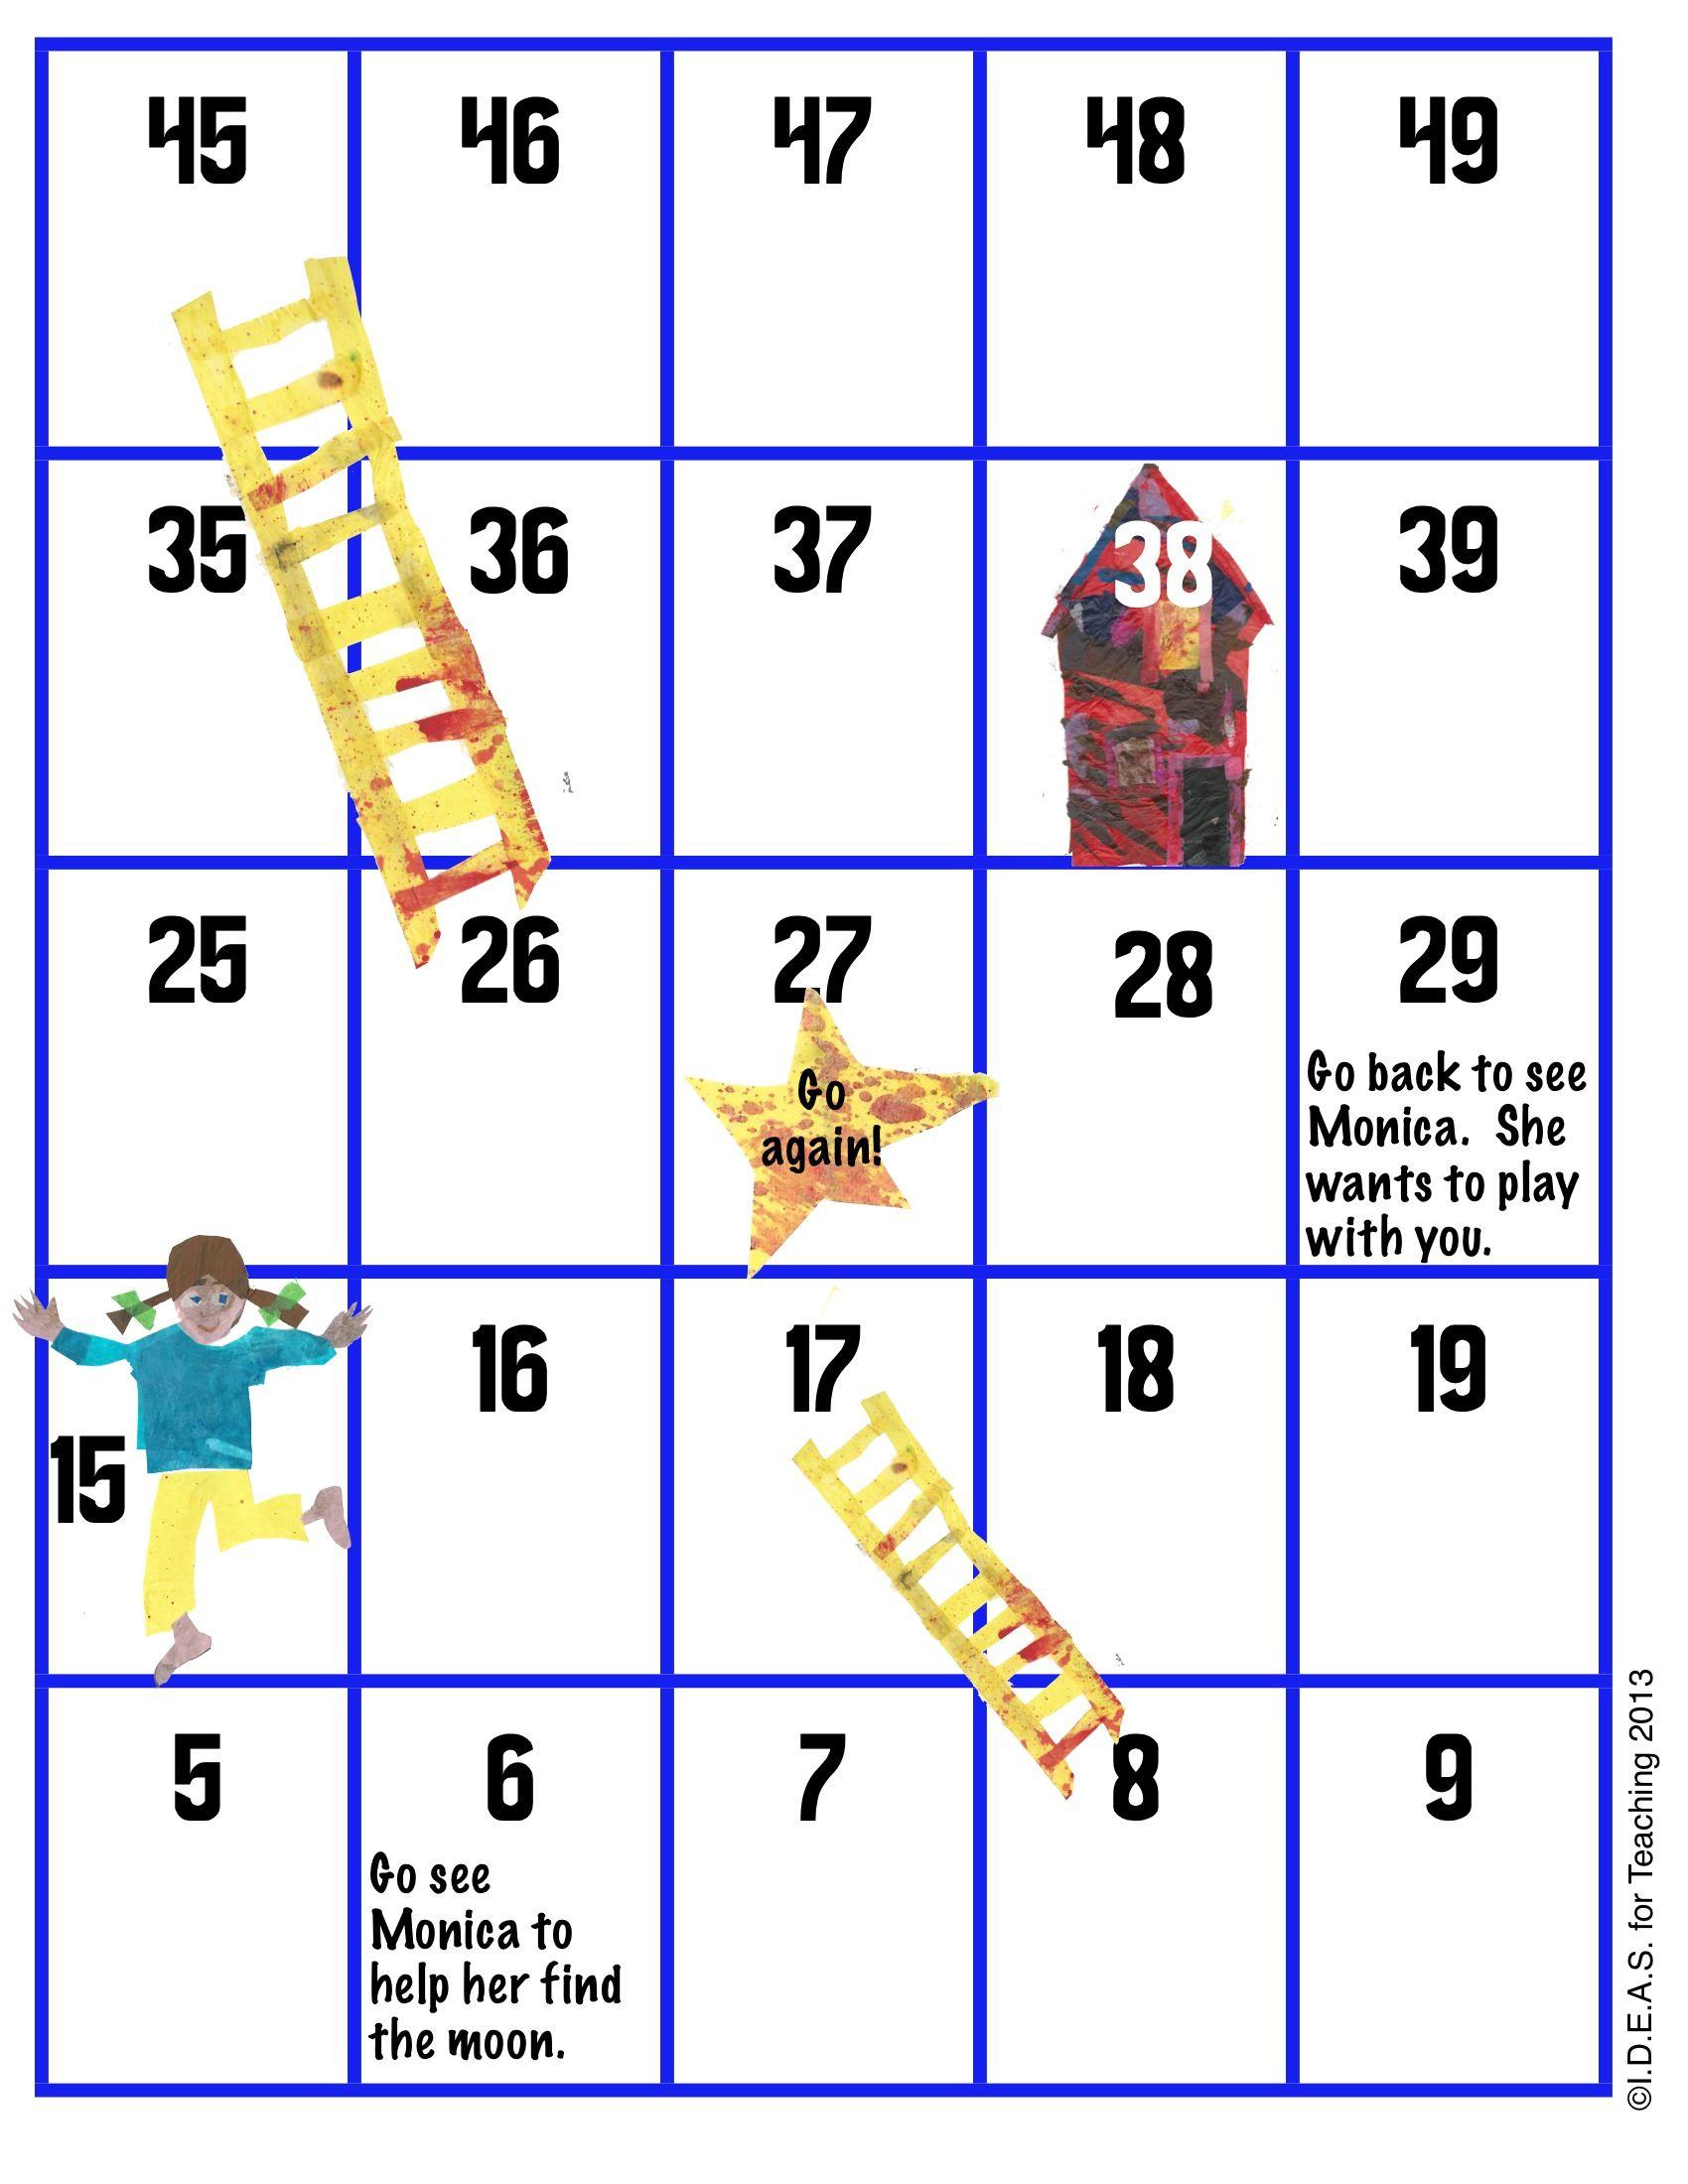 Http Www Teacherspayteachers Com Product Eric Carles Papa Please Get The Moon For Me Common Core Math Board Game 791578 Inspi Free Math Lessons Math Fun Math